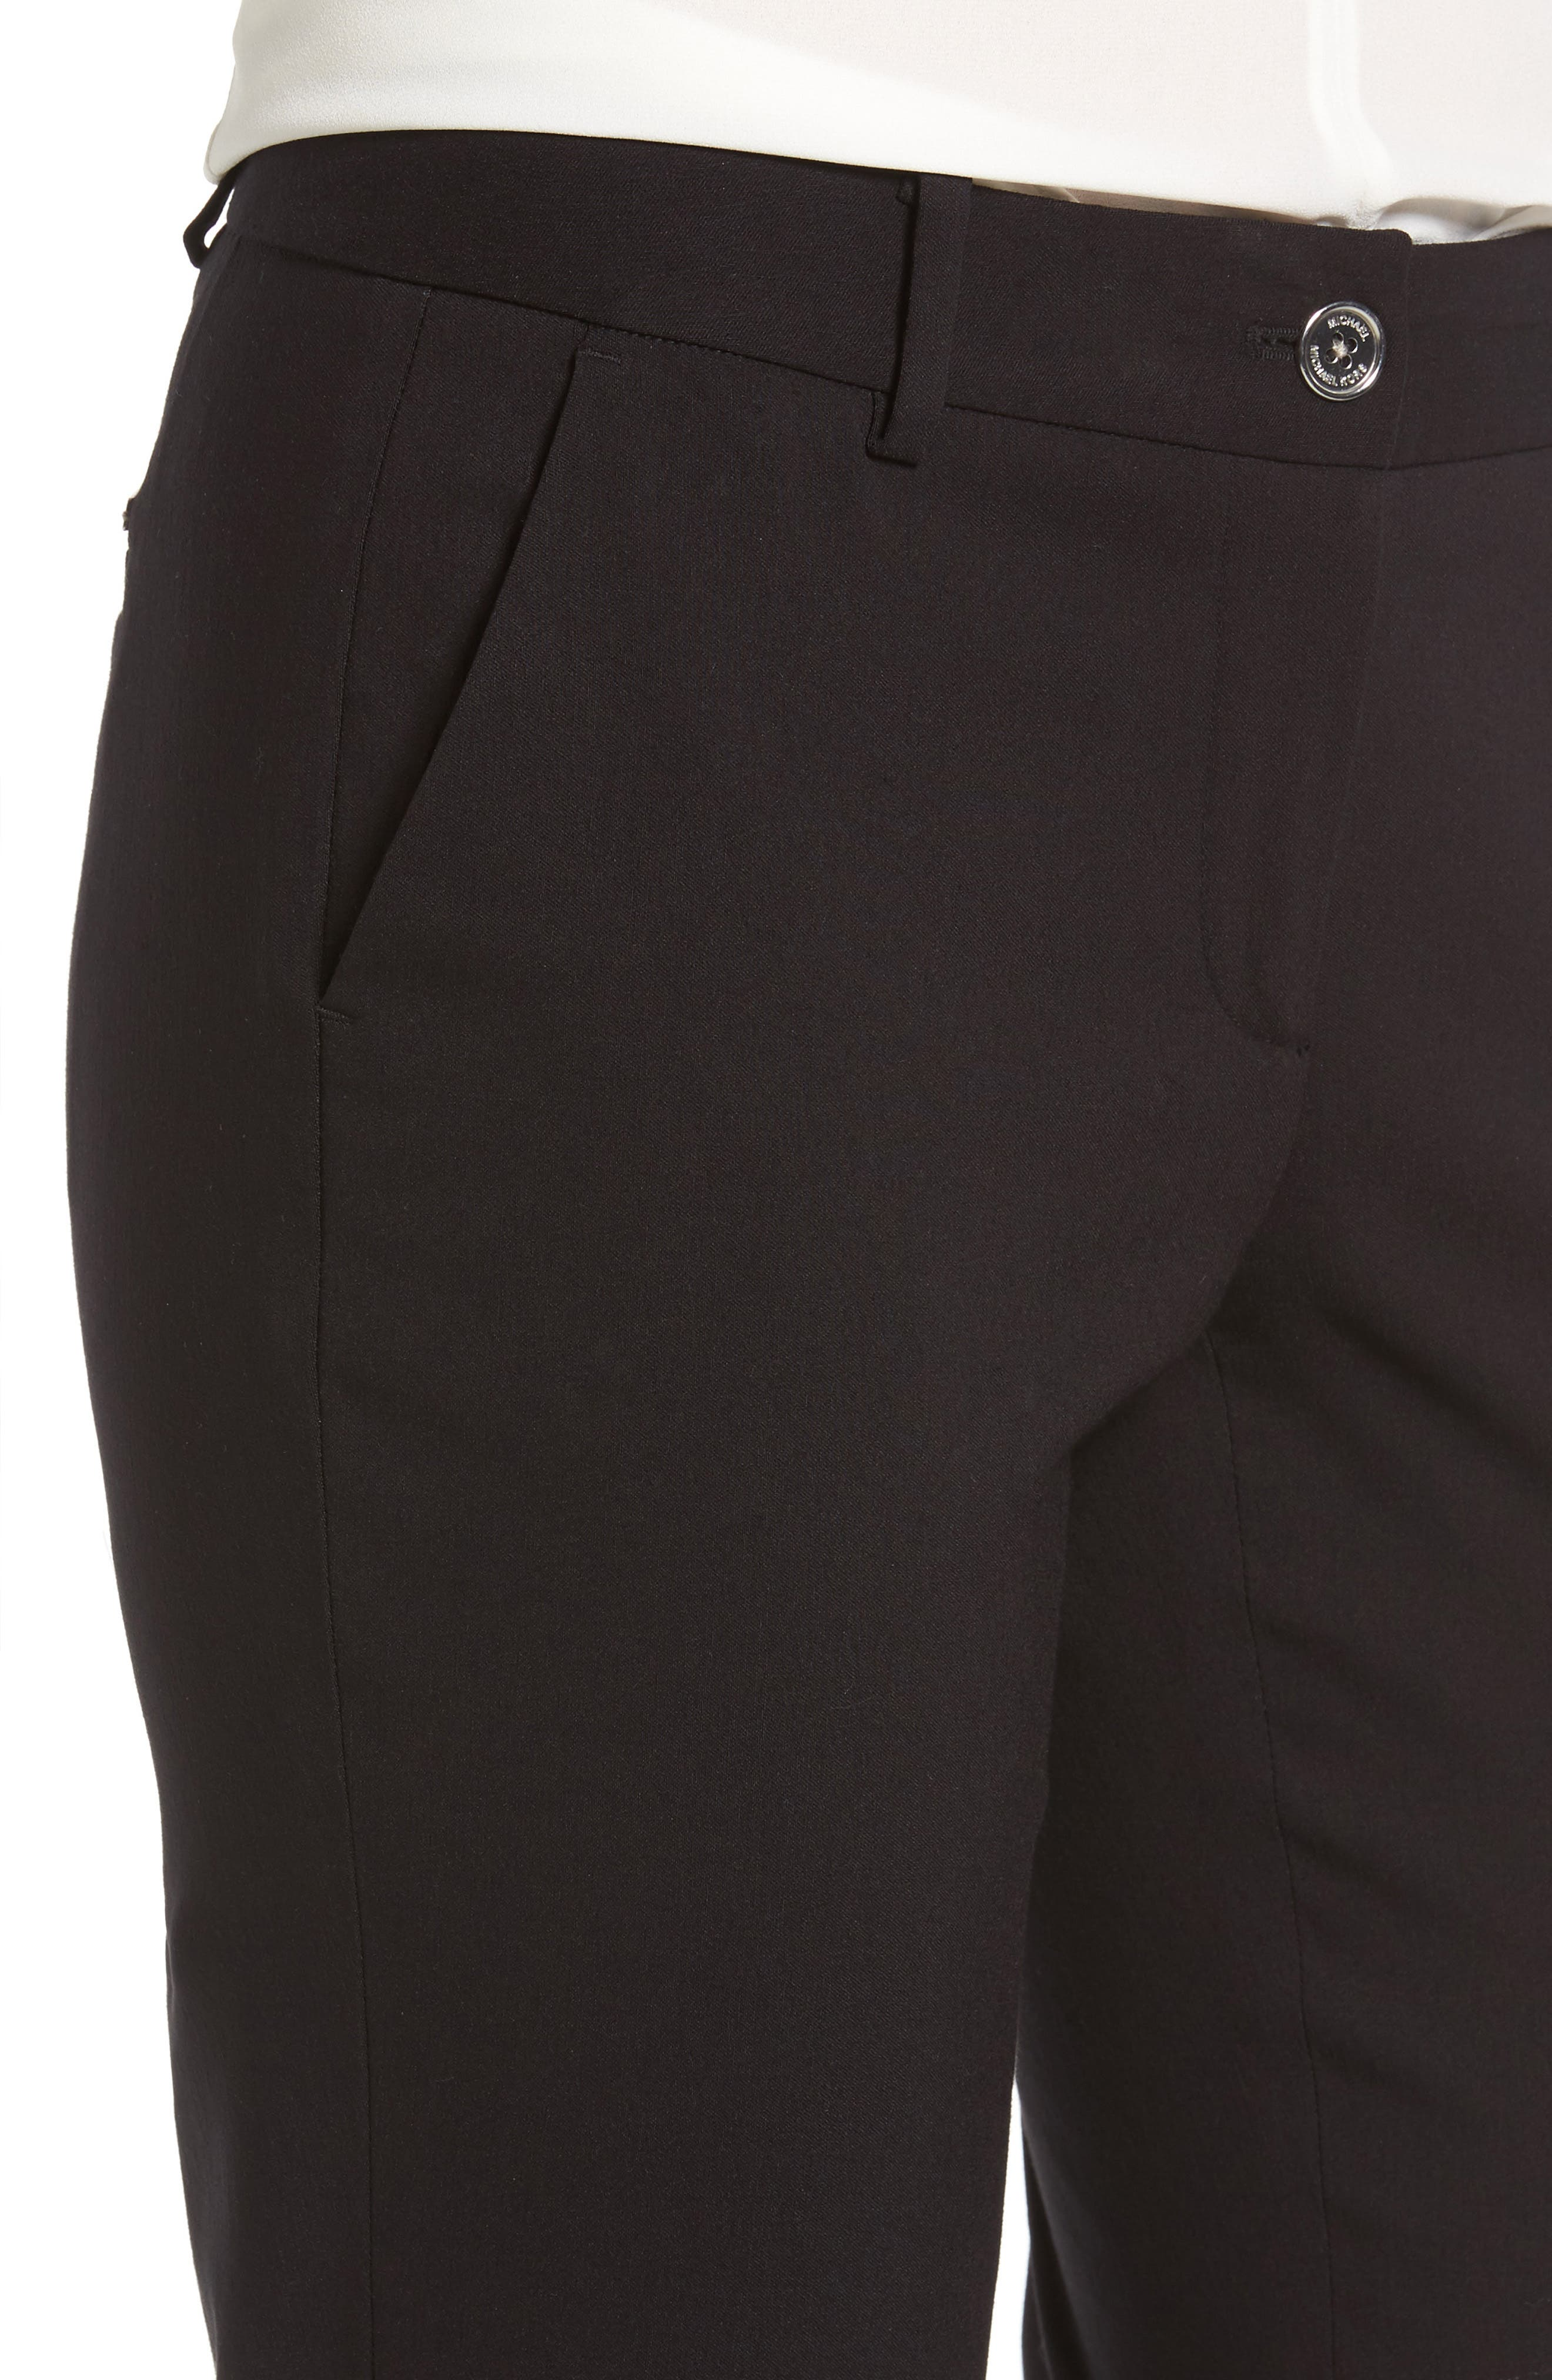 Miranda Slim Ankle Pants,                             Alternate thumbnail 4, color,                             Black